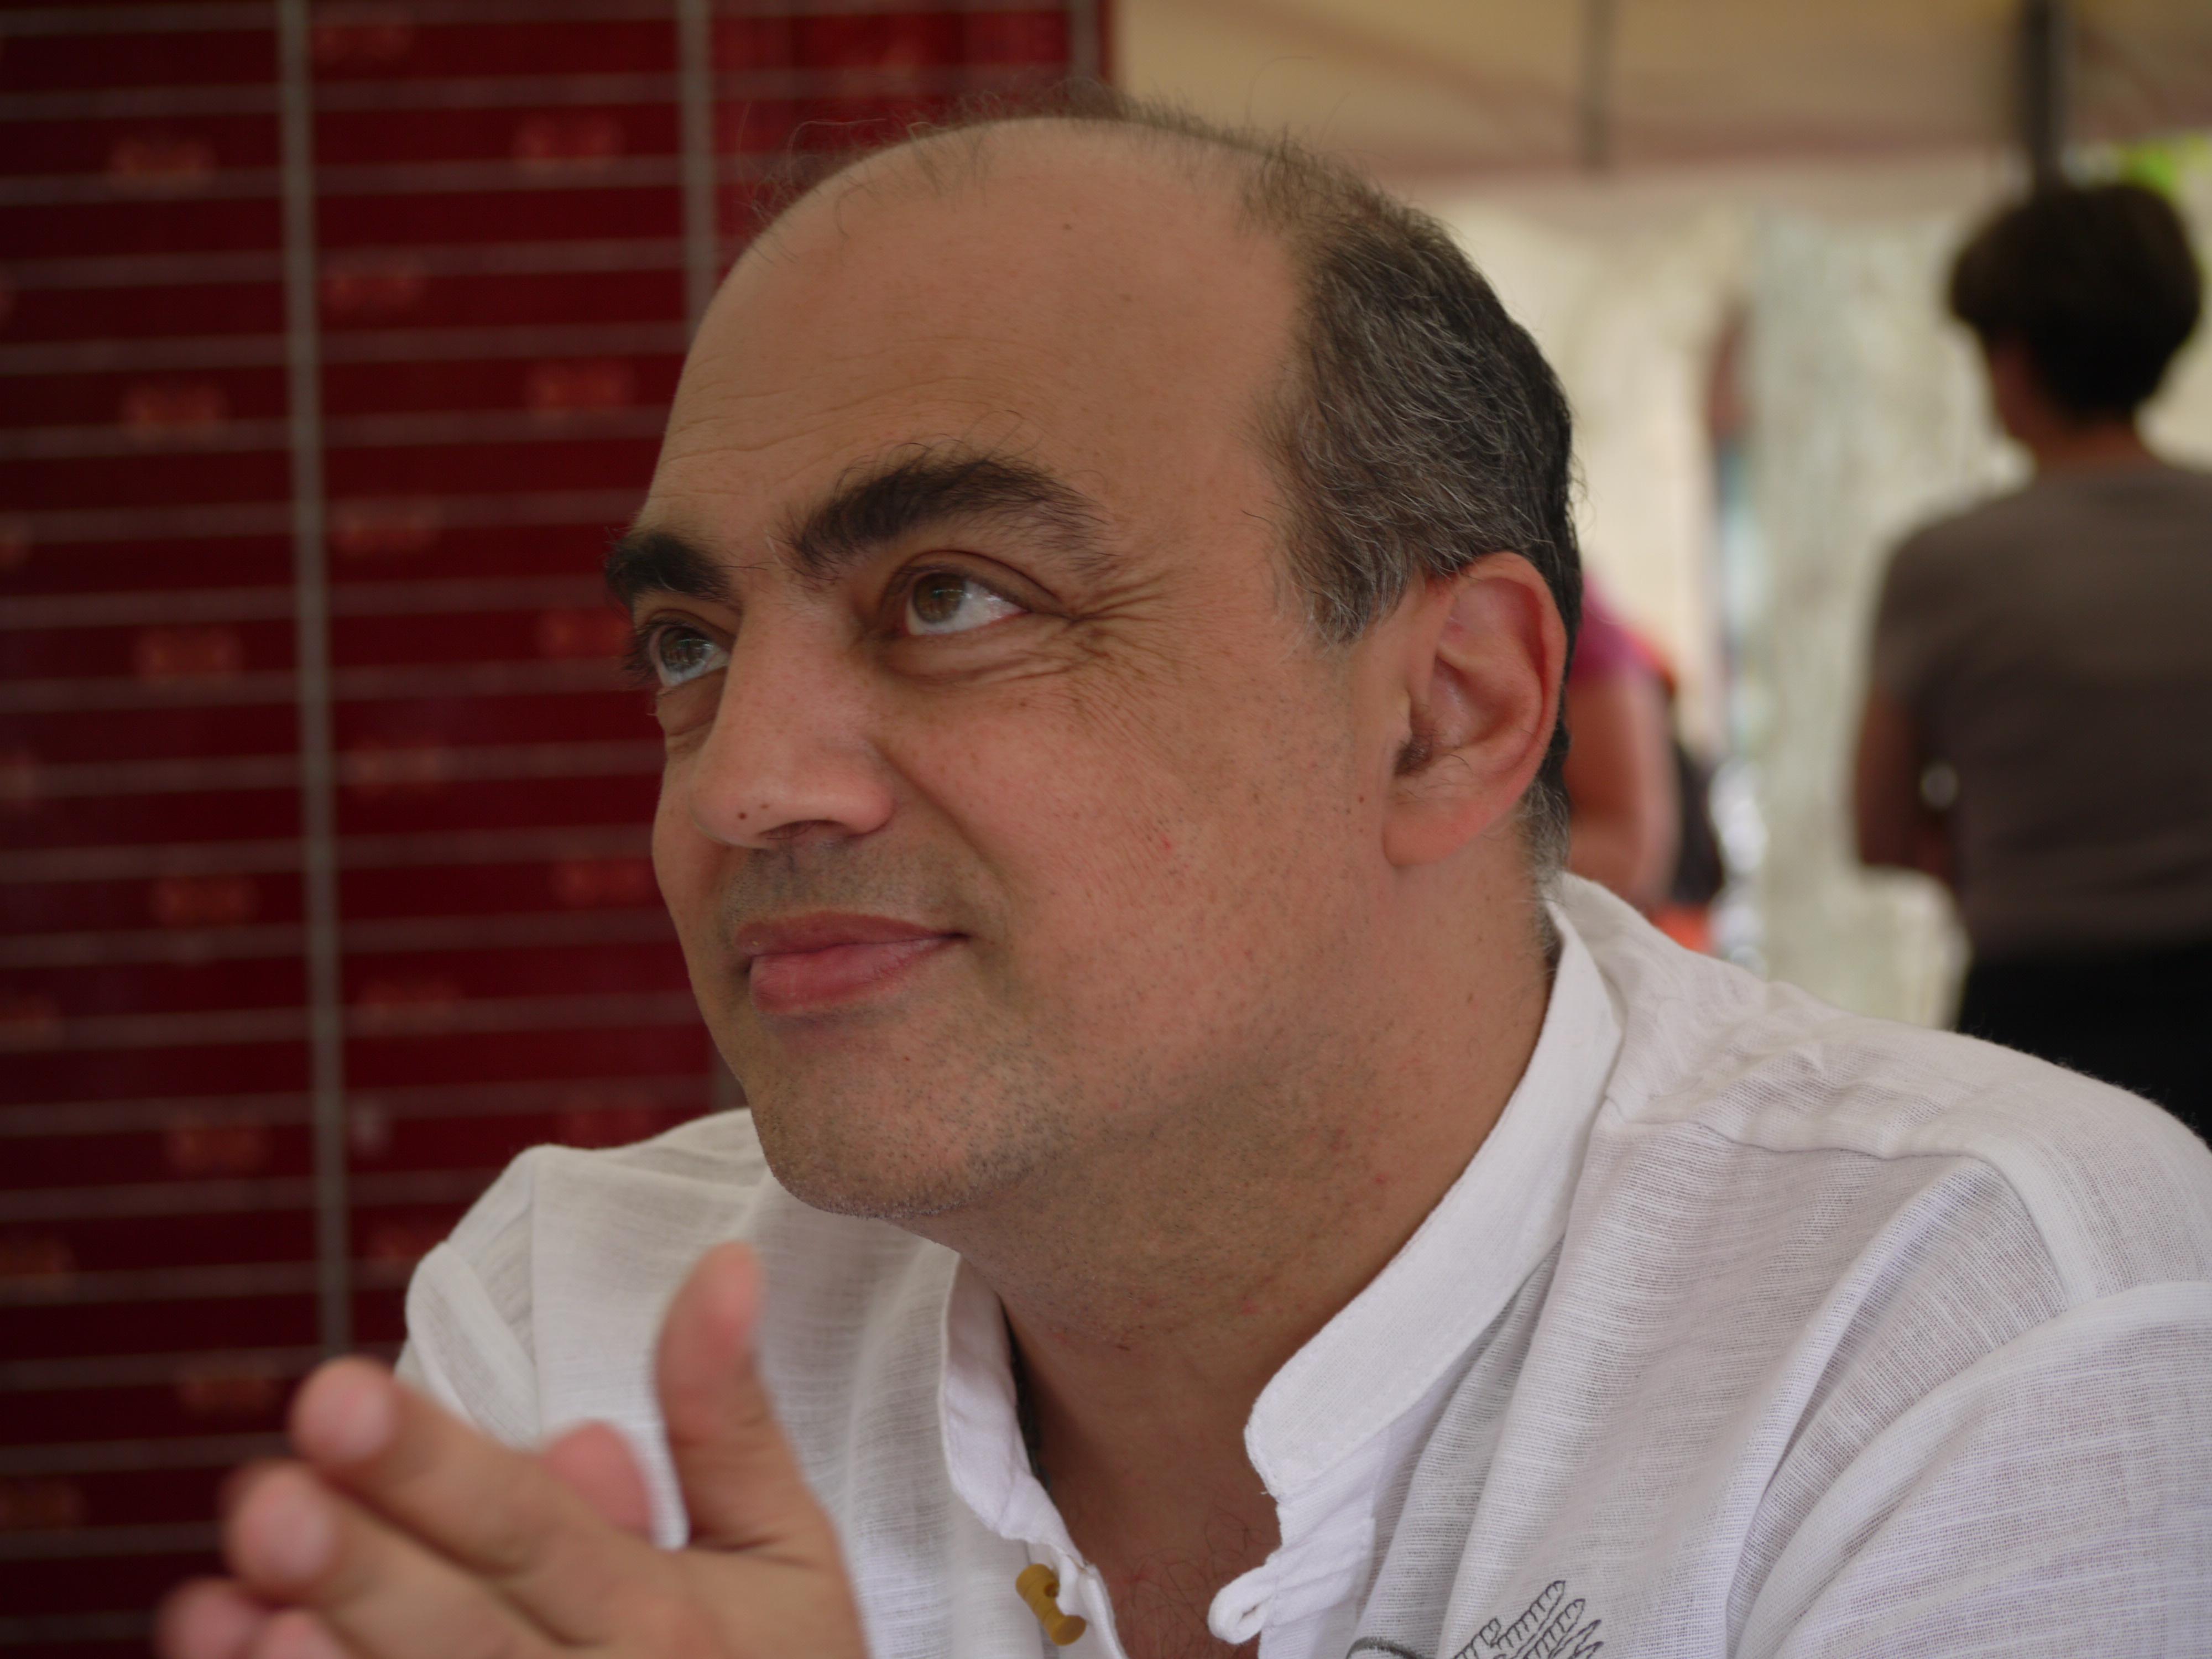 http://upload.wikimedia.org/wikipedia/commons/b/ba/P1070963_-_Pierre_JOVANOVIC.JPG